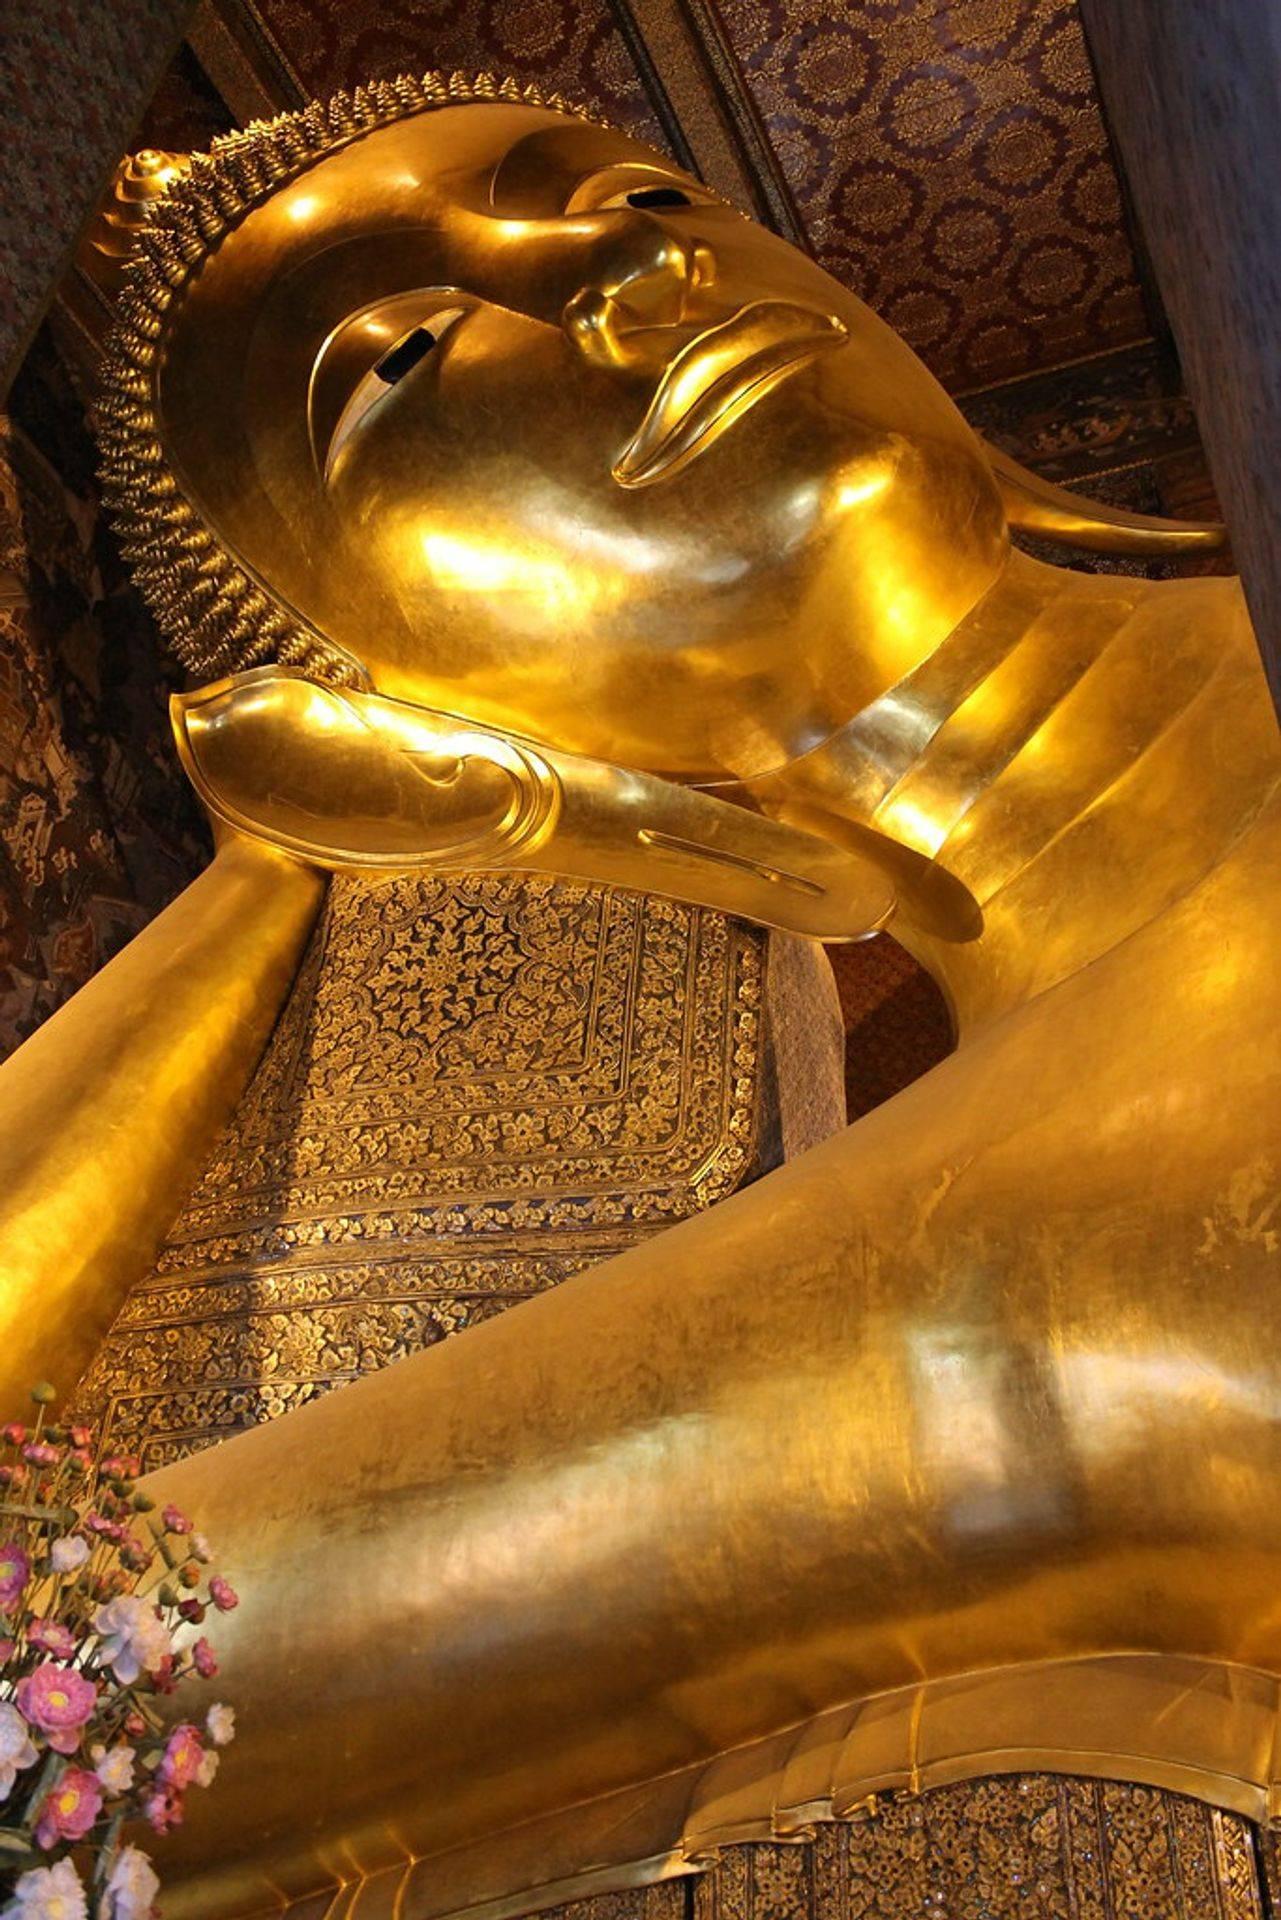 Bangkok - Bouddha couché